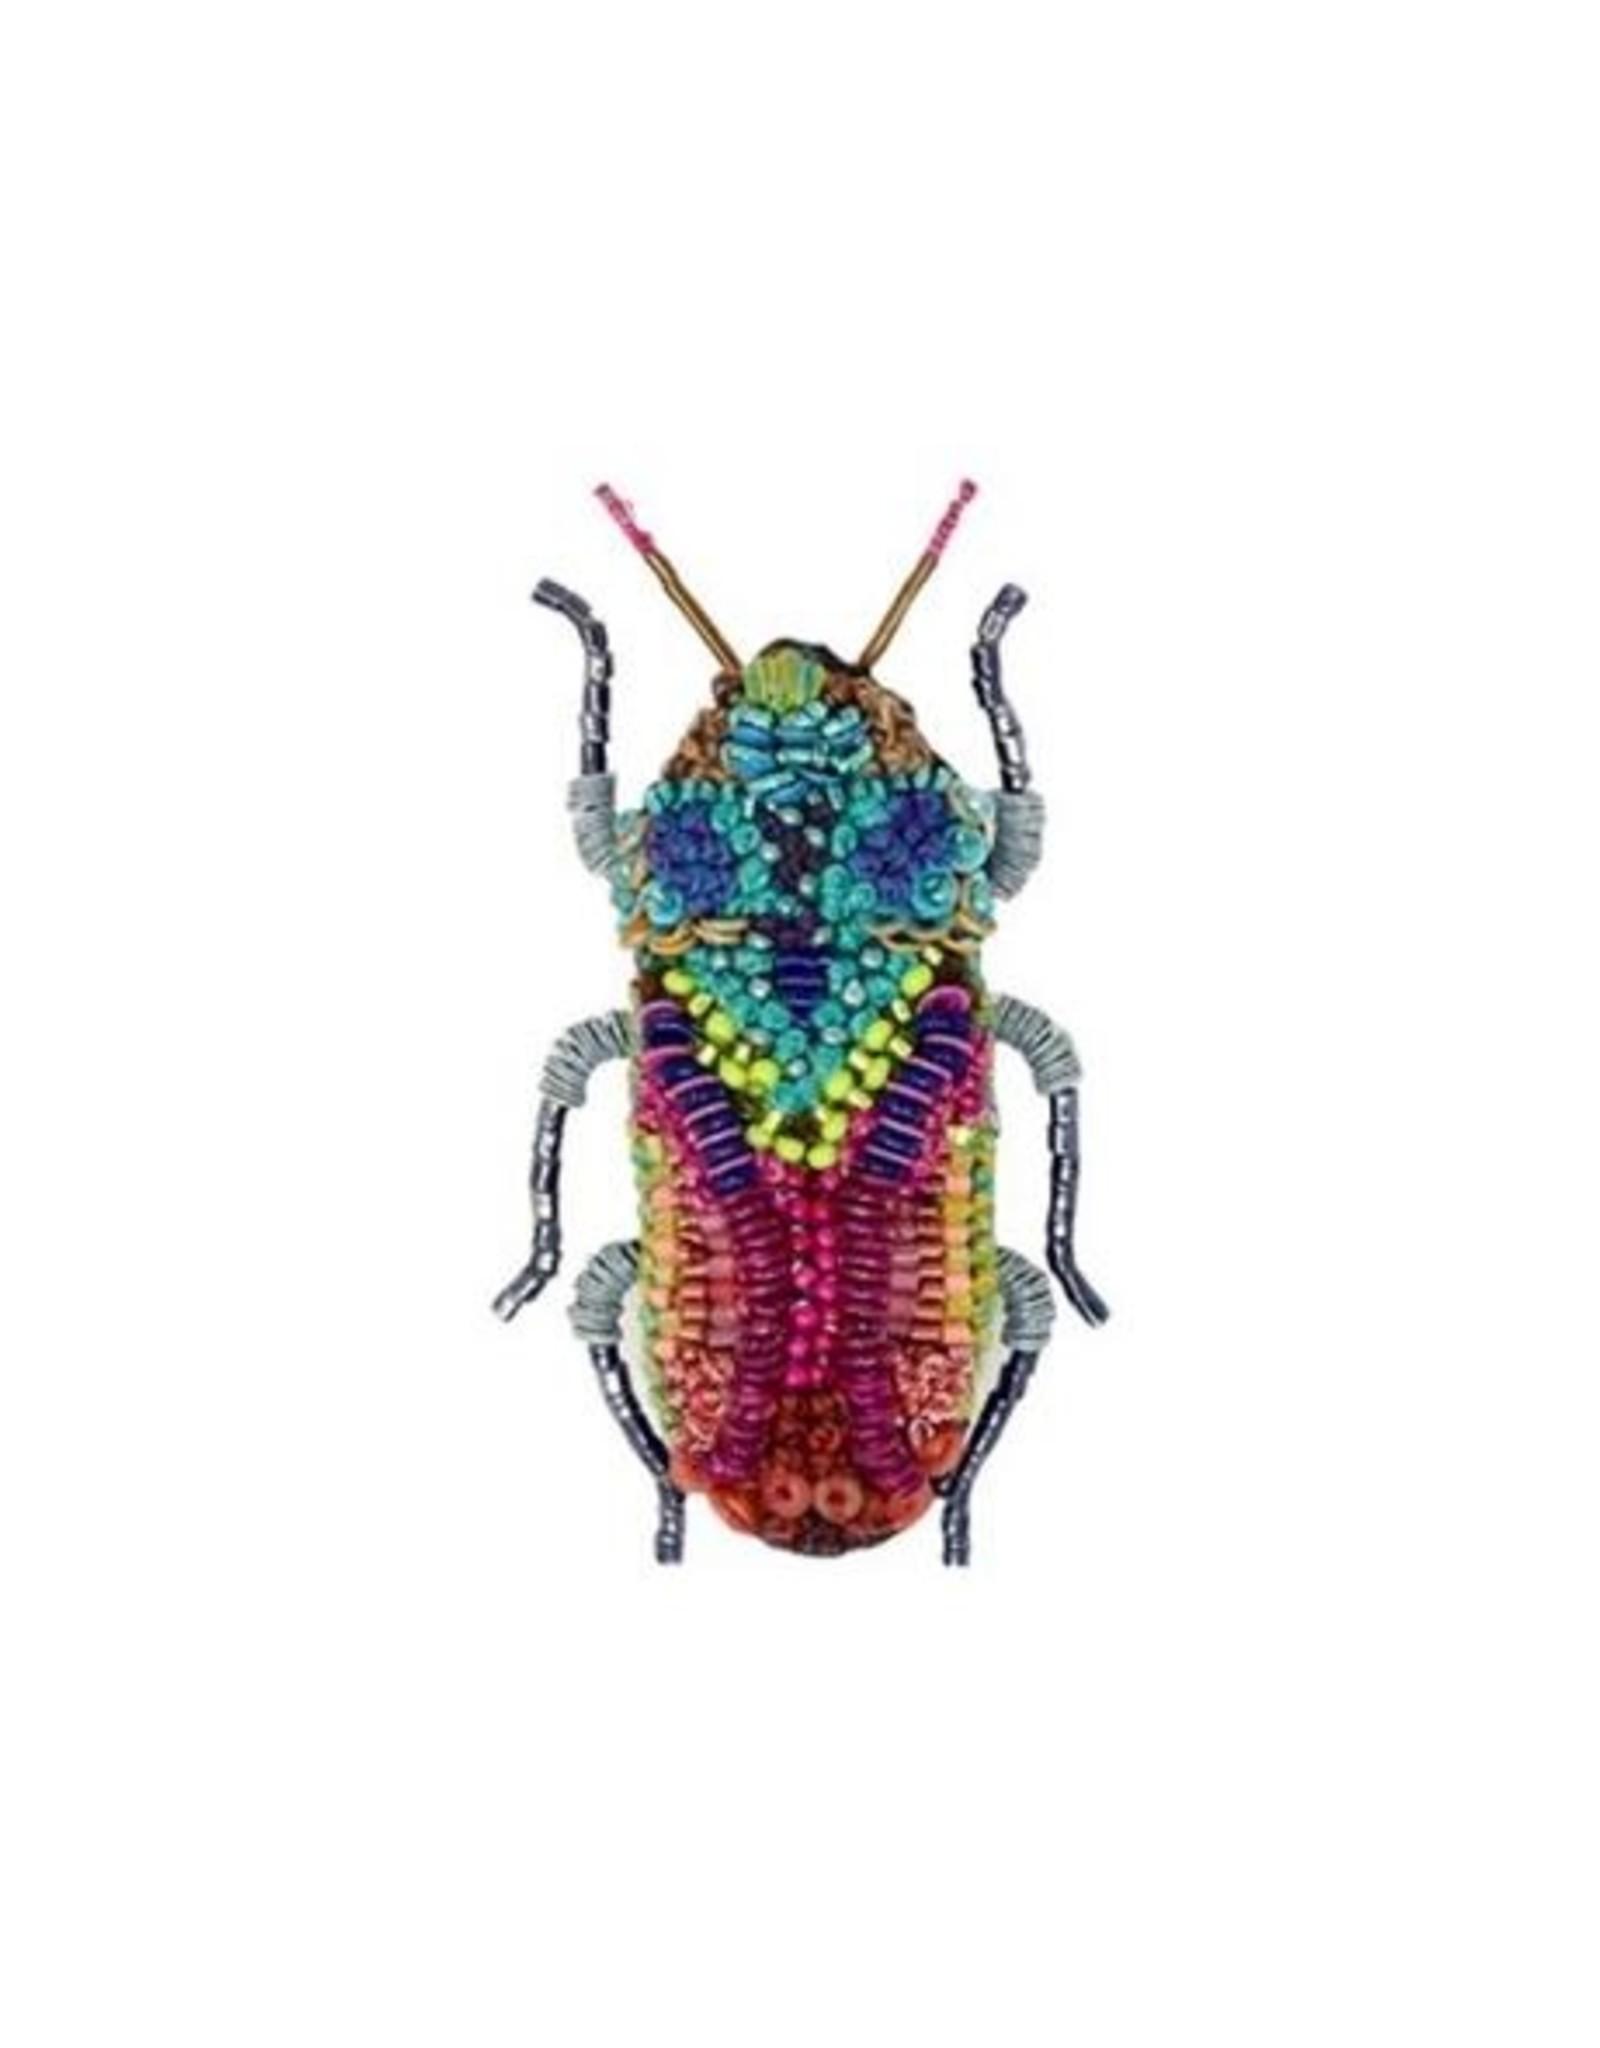 Moroccan Jewel Beetle Brooch Pin